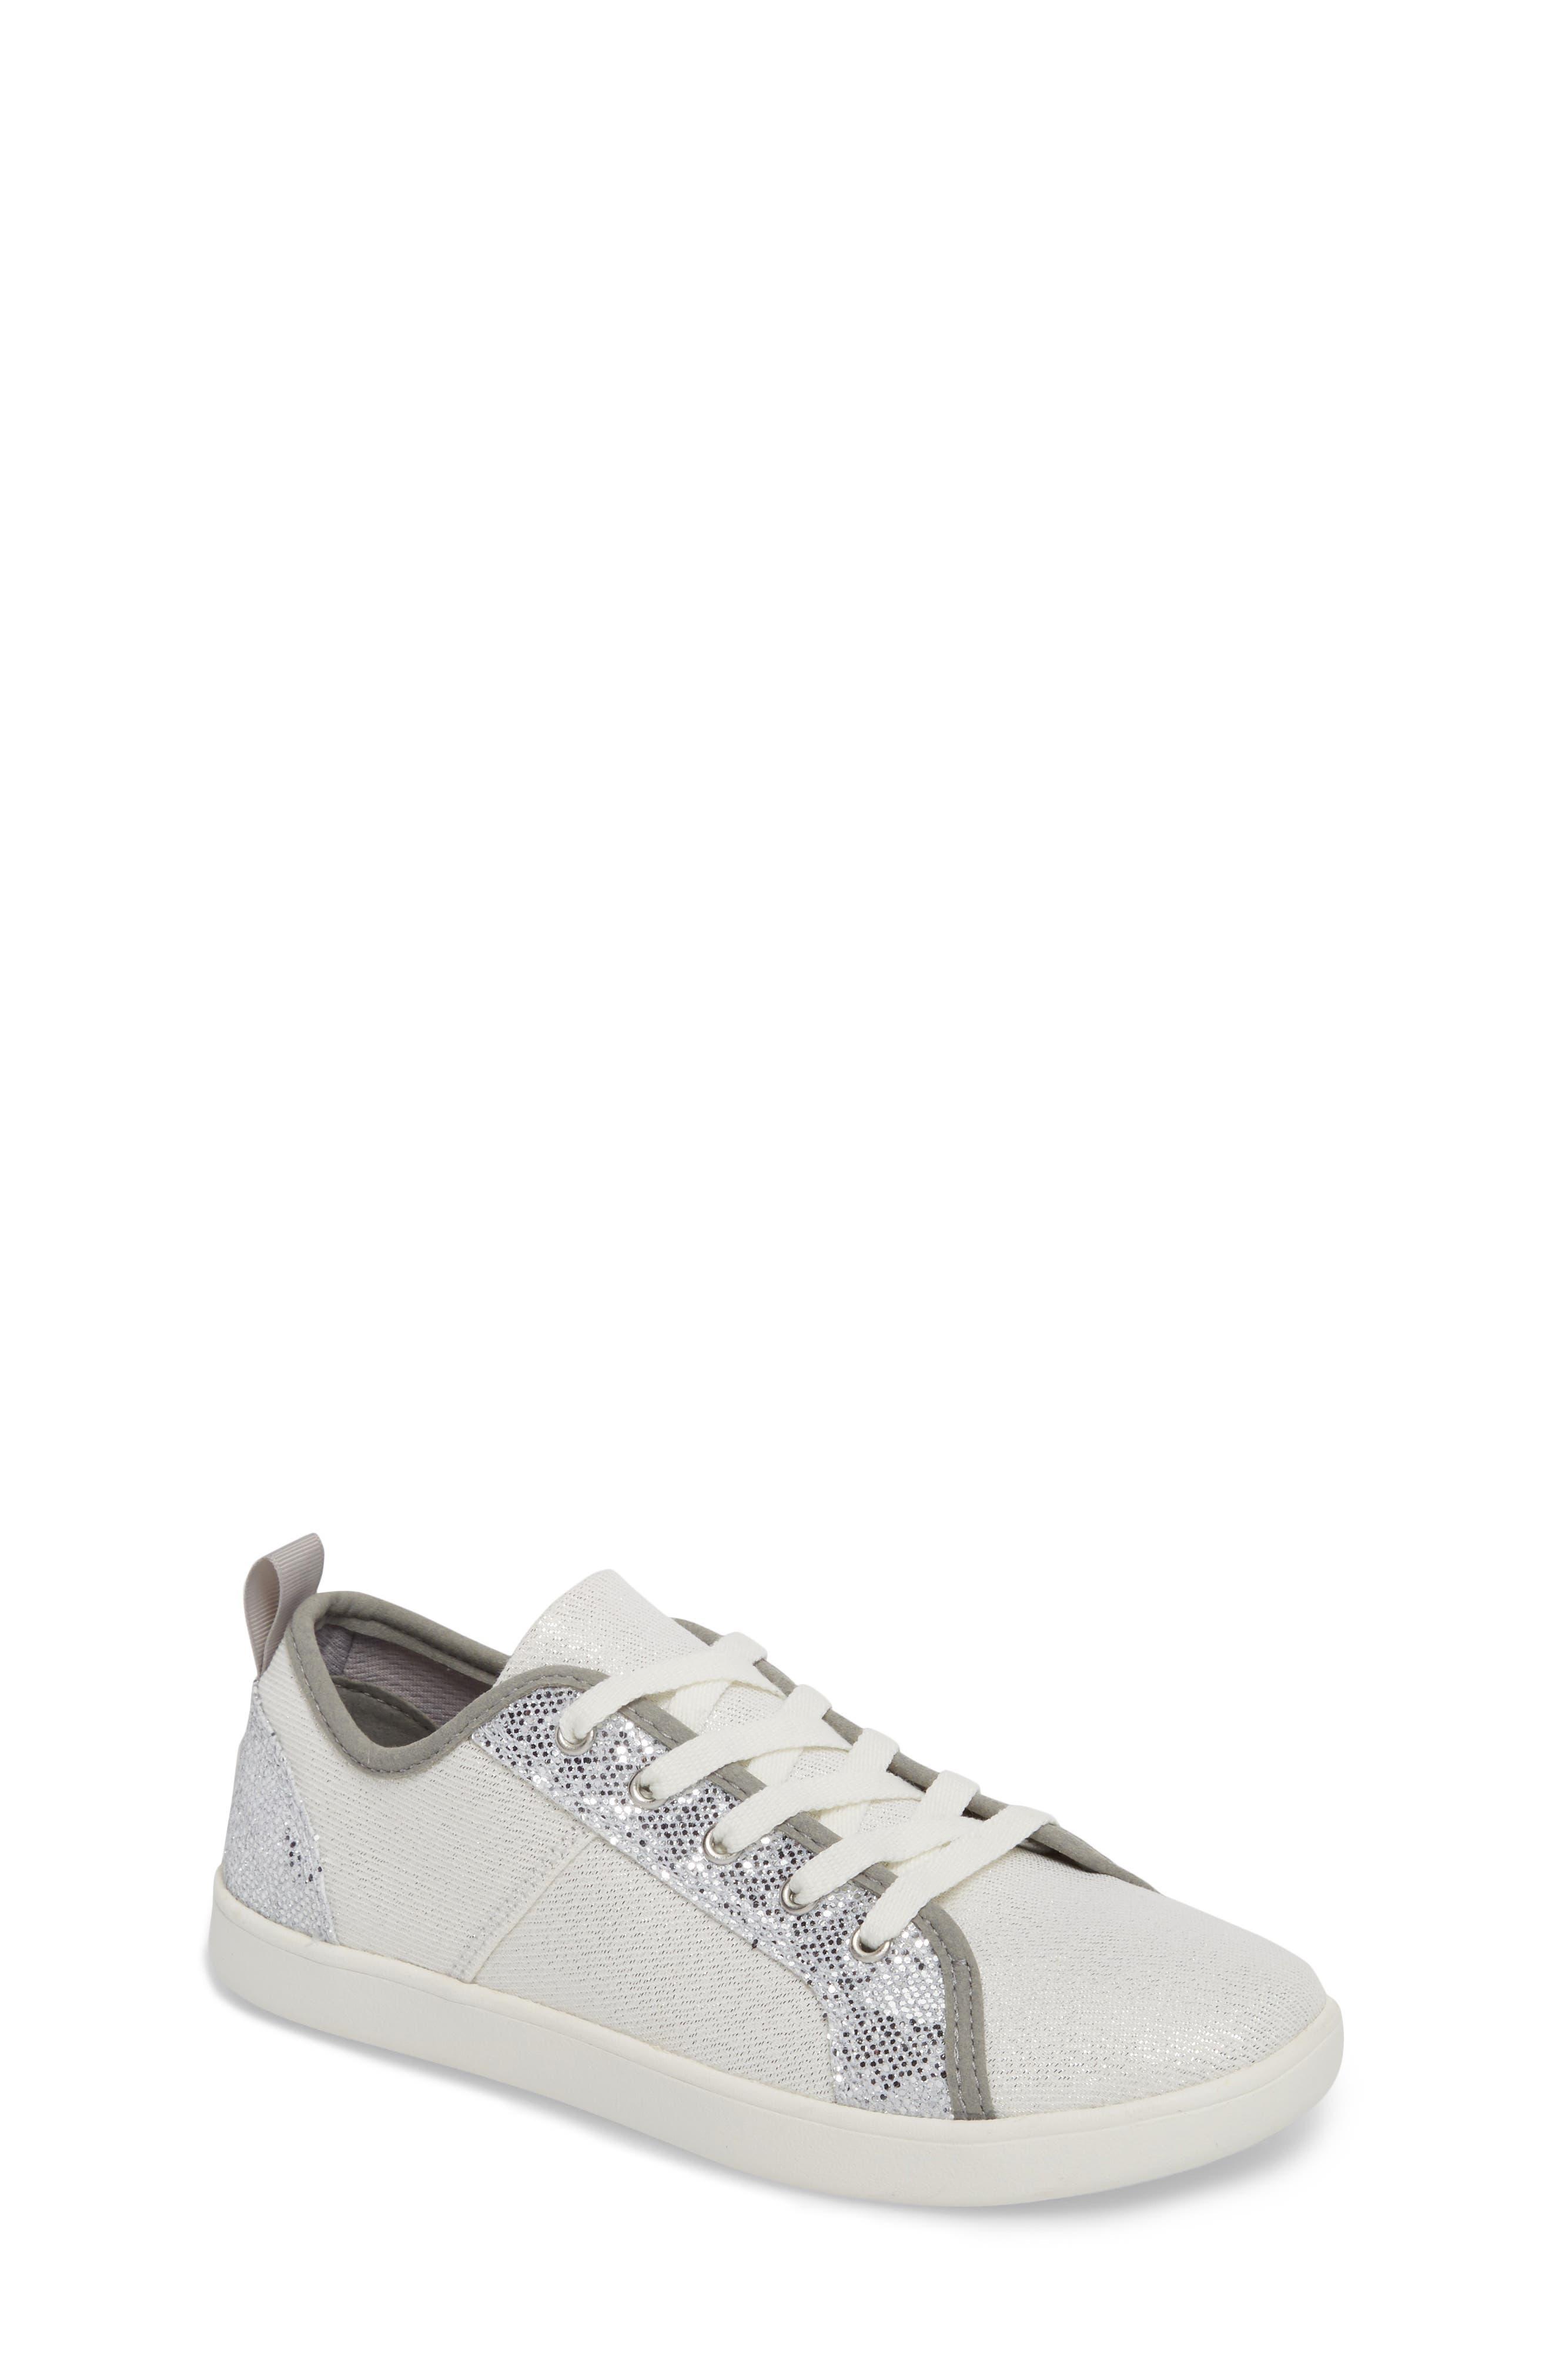 Irvin Sparkles Metallic Sneaker,                         Main,                         color, Silver